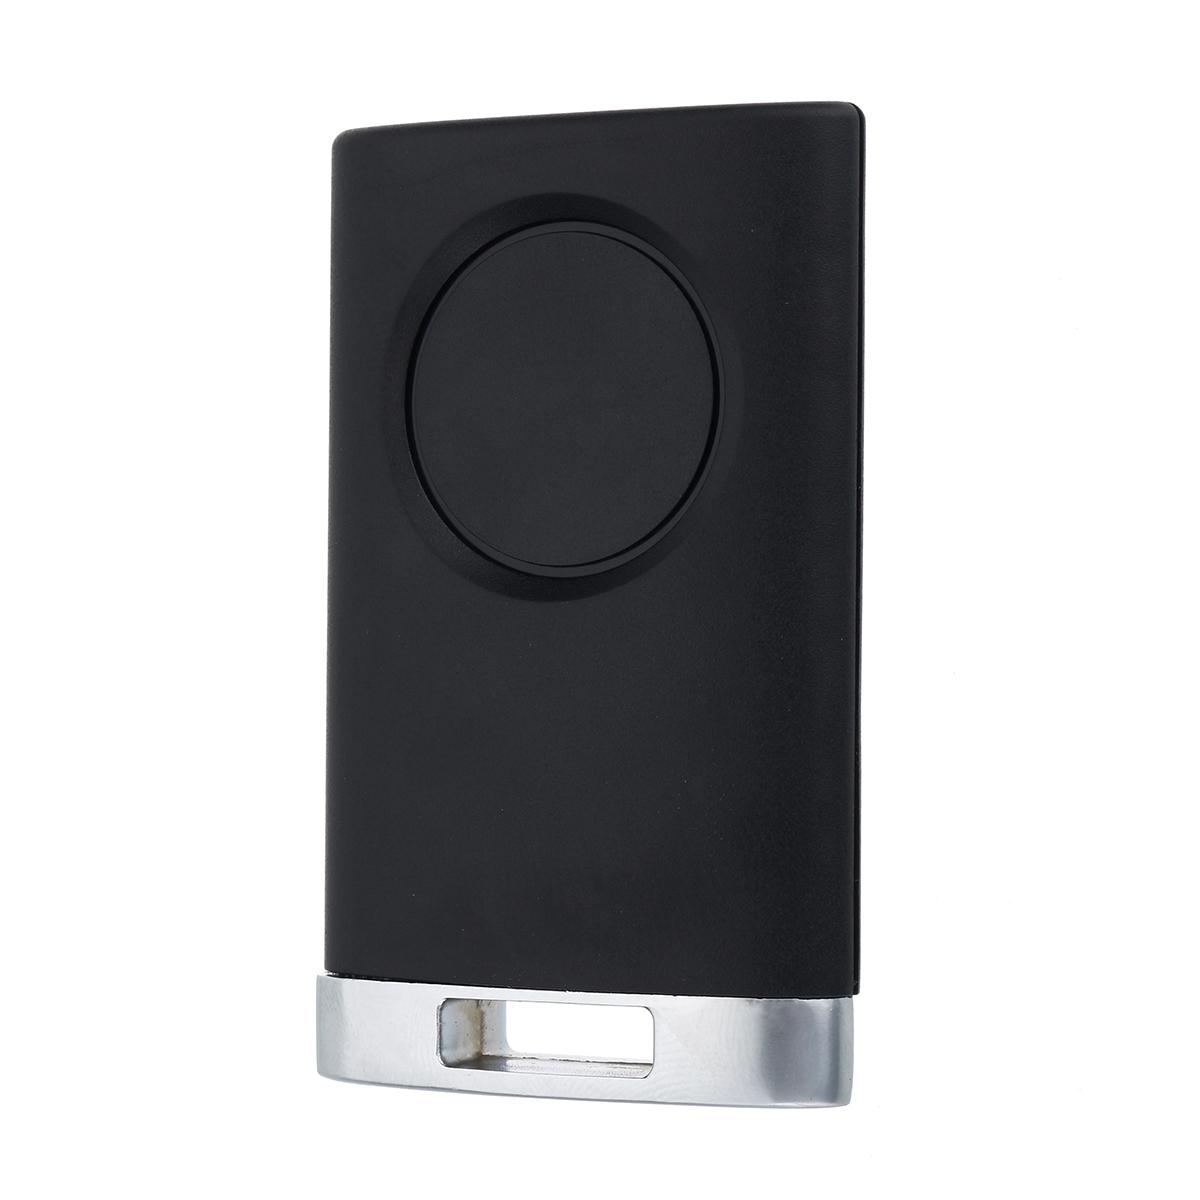 5 Кнопка Дистанционный Key Fob Keyless Entry Shell C Клинок для Cadillac CTS DTS STS XTS - фото 3